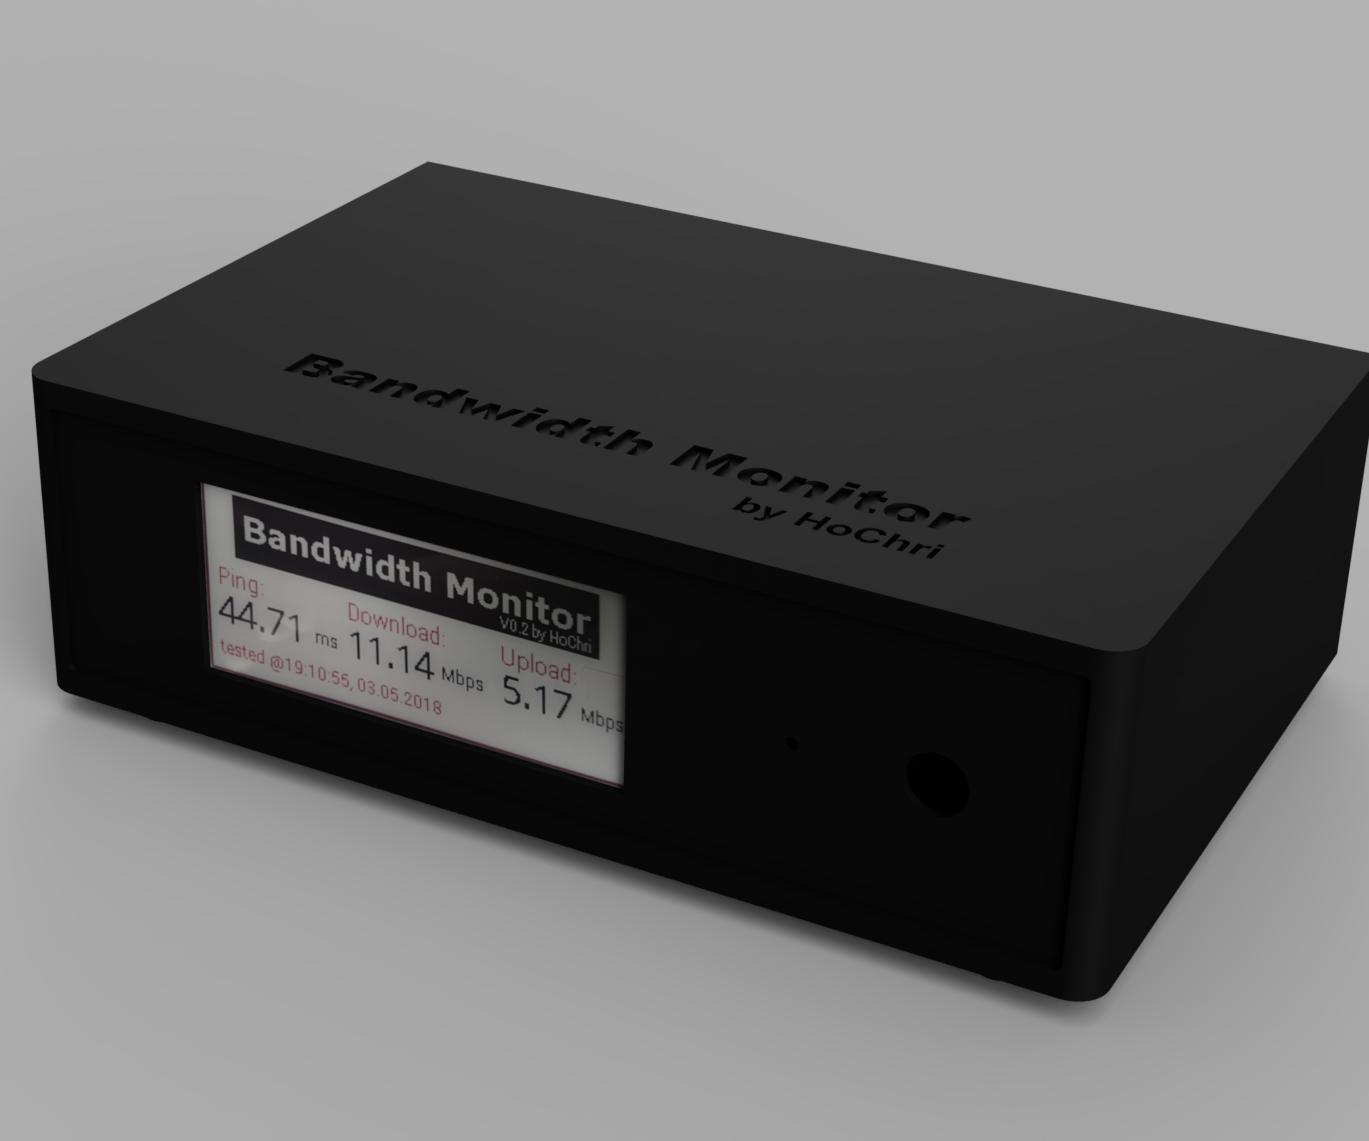 Bandwidth Monitor